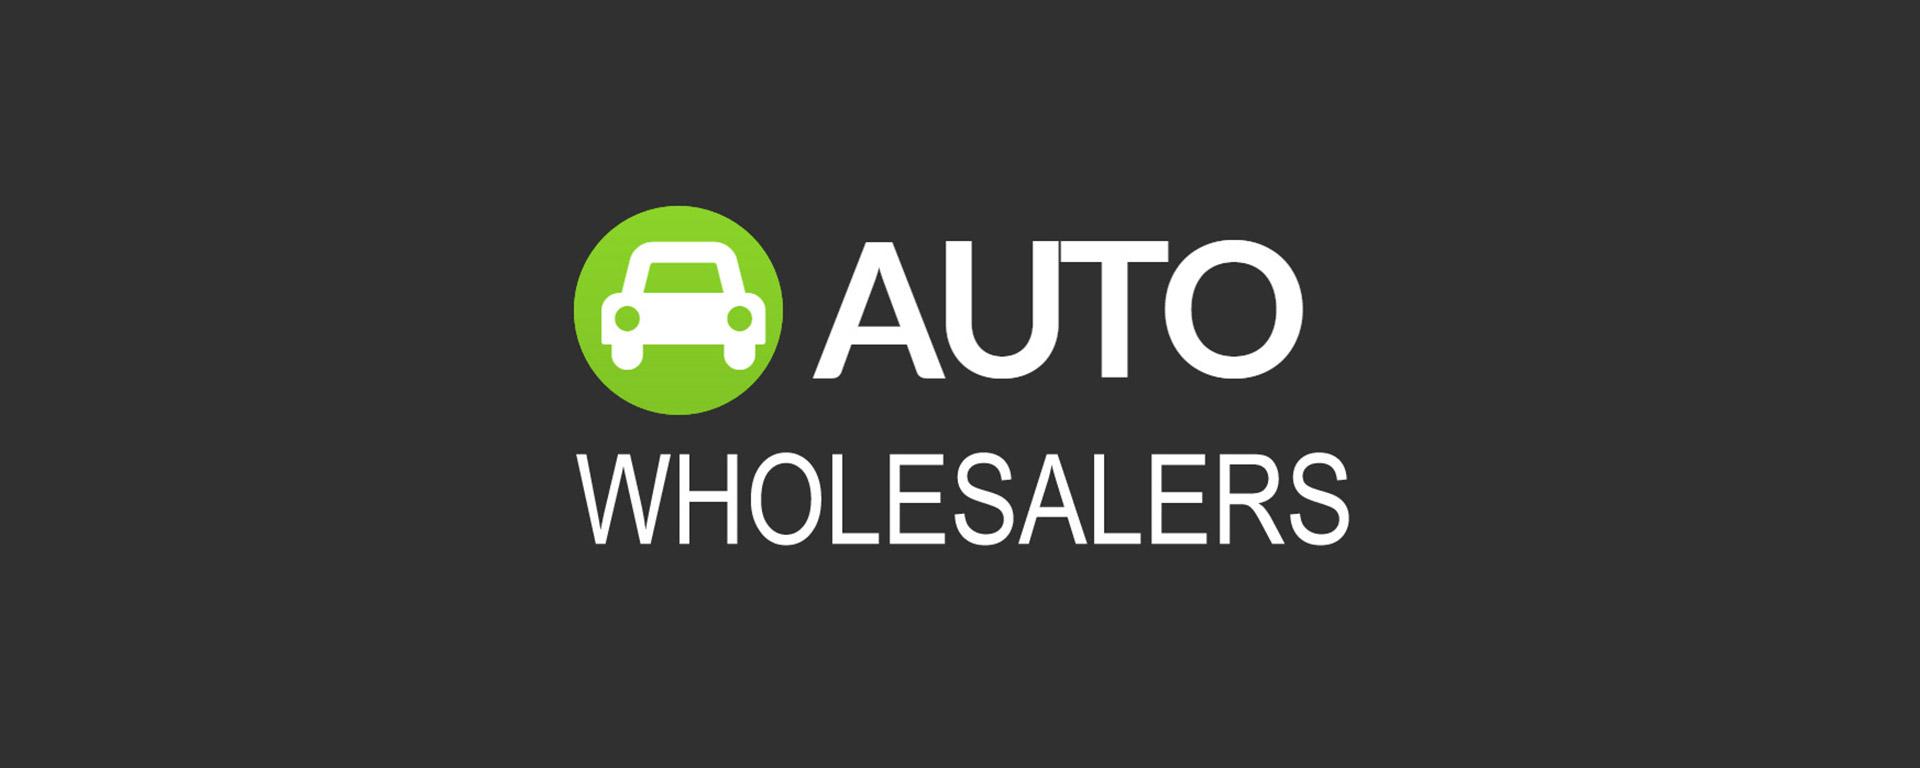 AutoWholesaler-banner